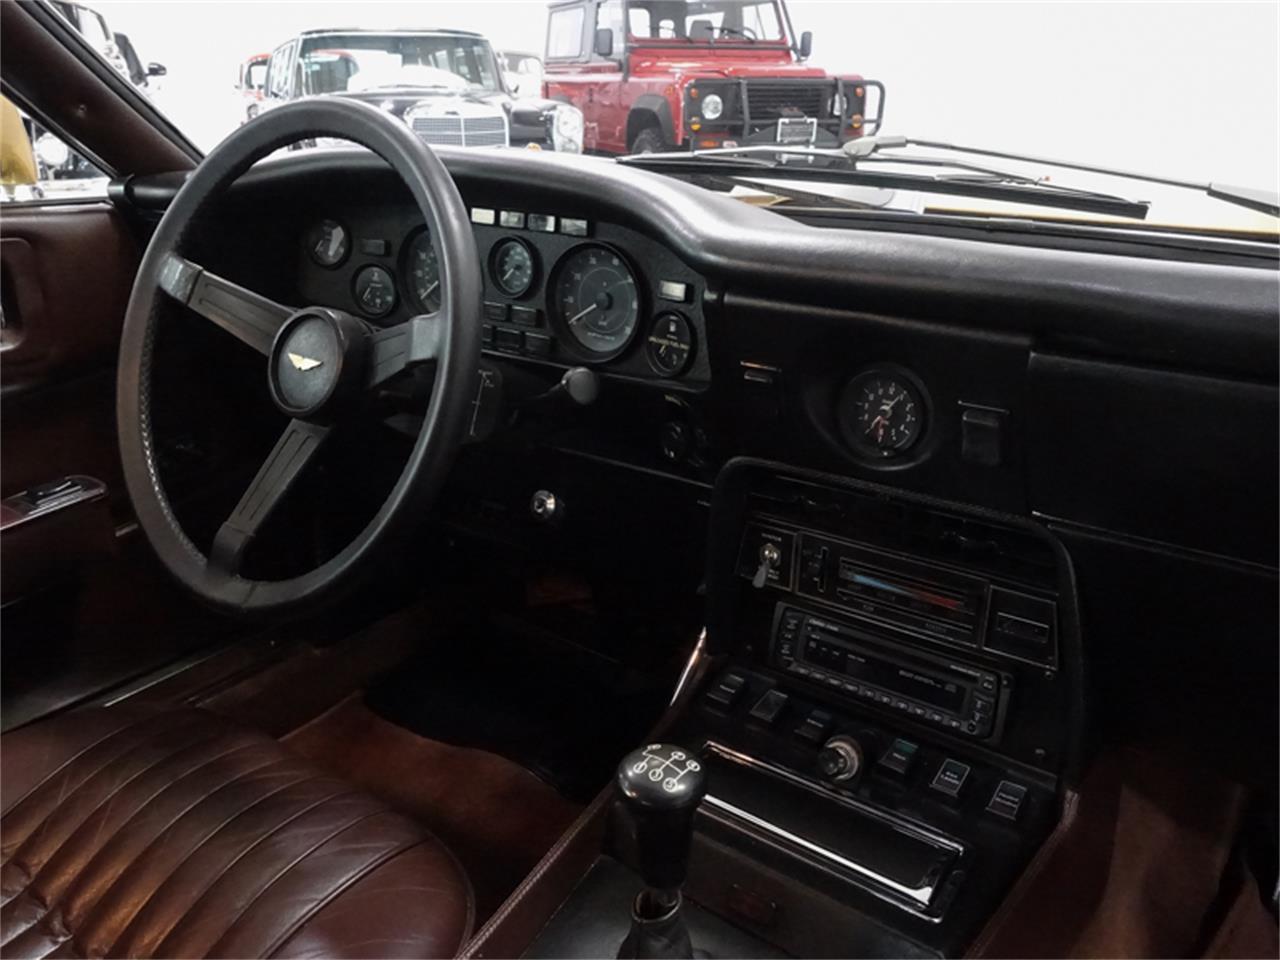 1979 Aston Martin V8 (CC-1086965) for sale in St. Louis, Missouri